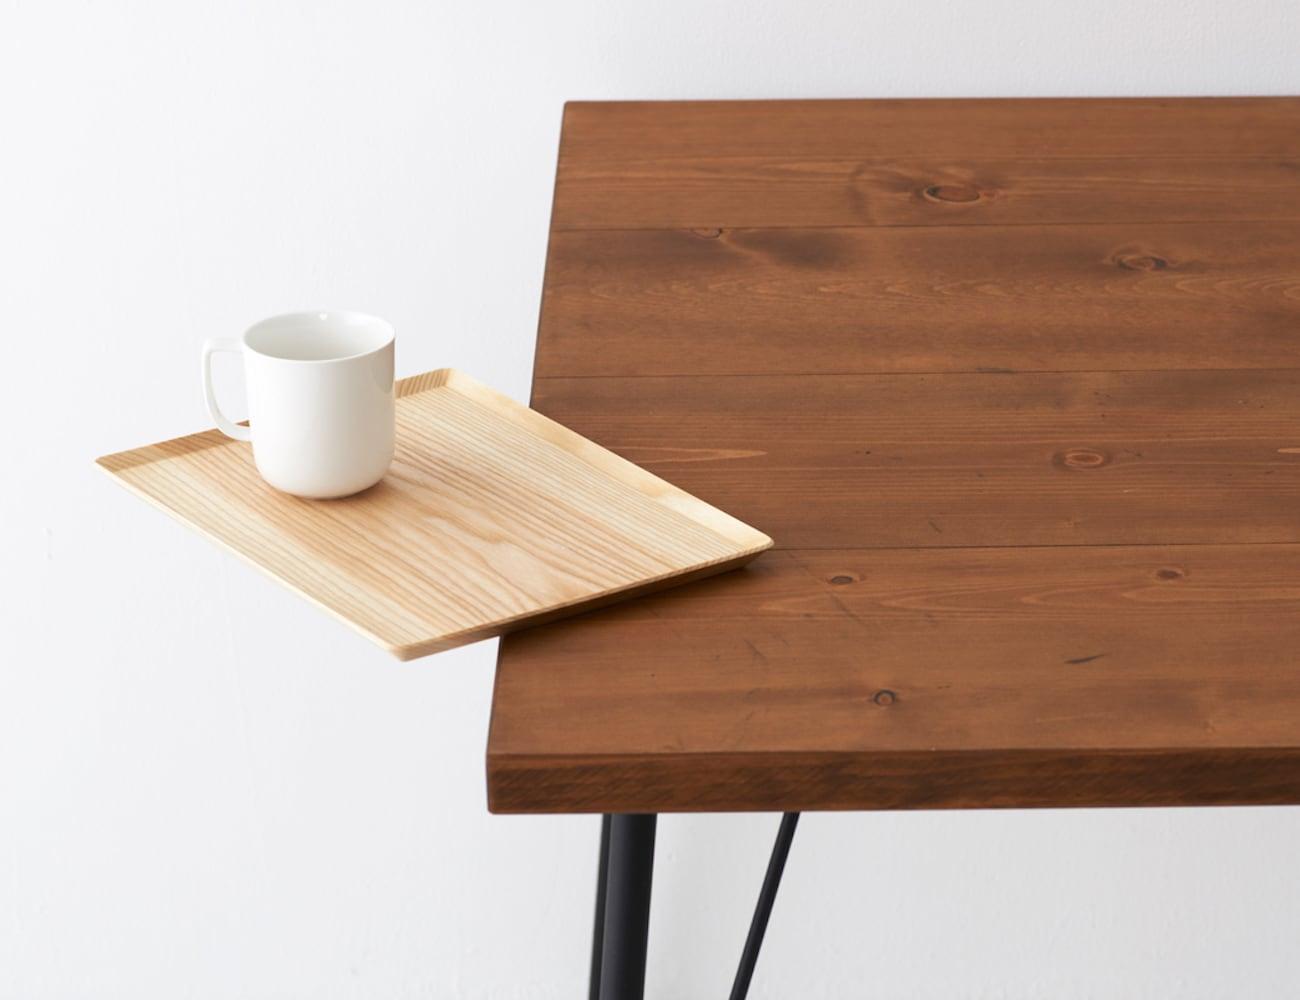 YOY Protrude Minimalist Wooden Tray